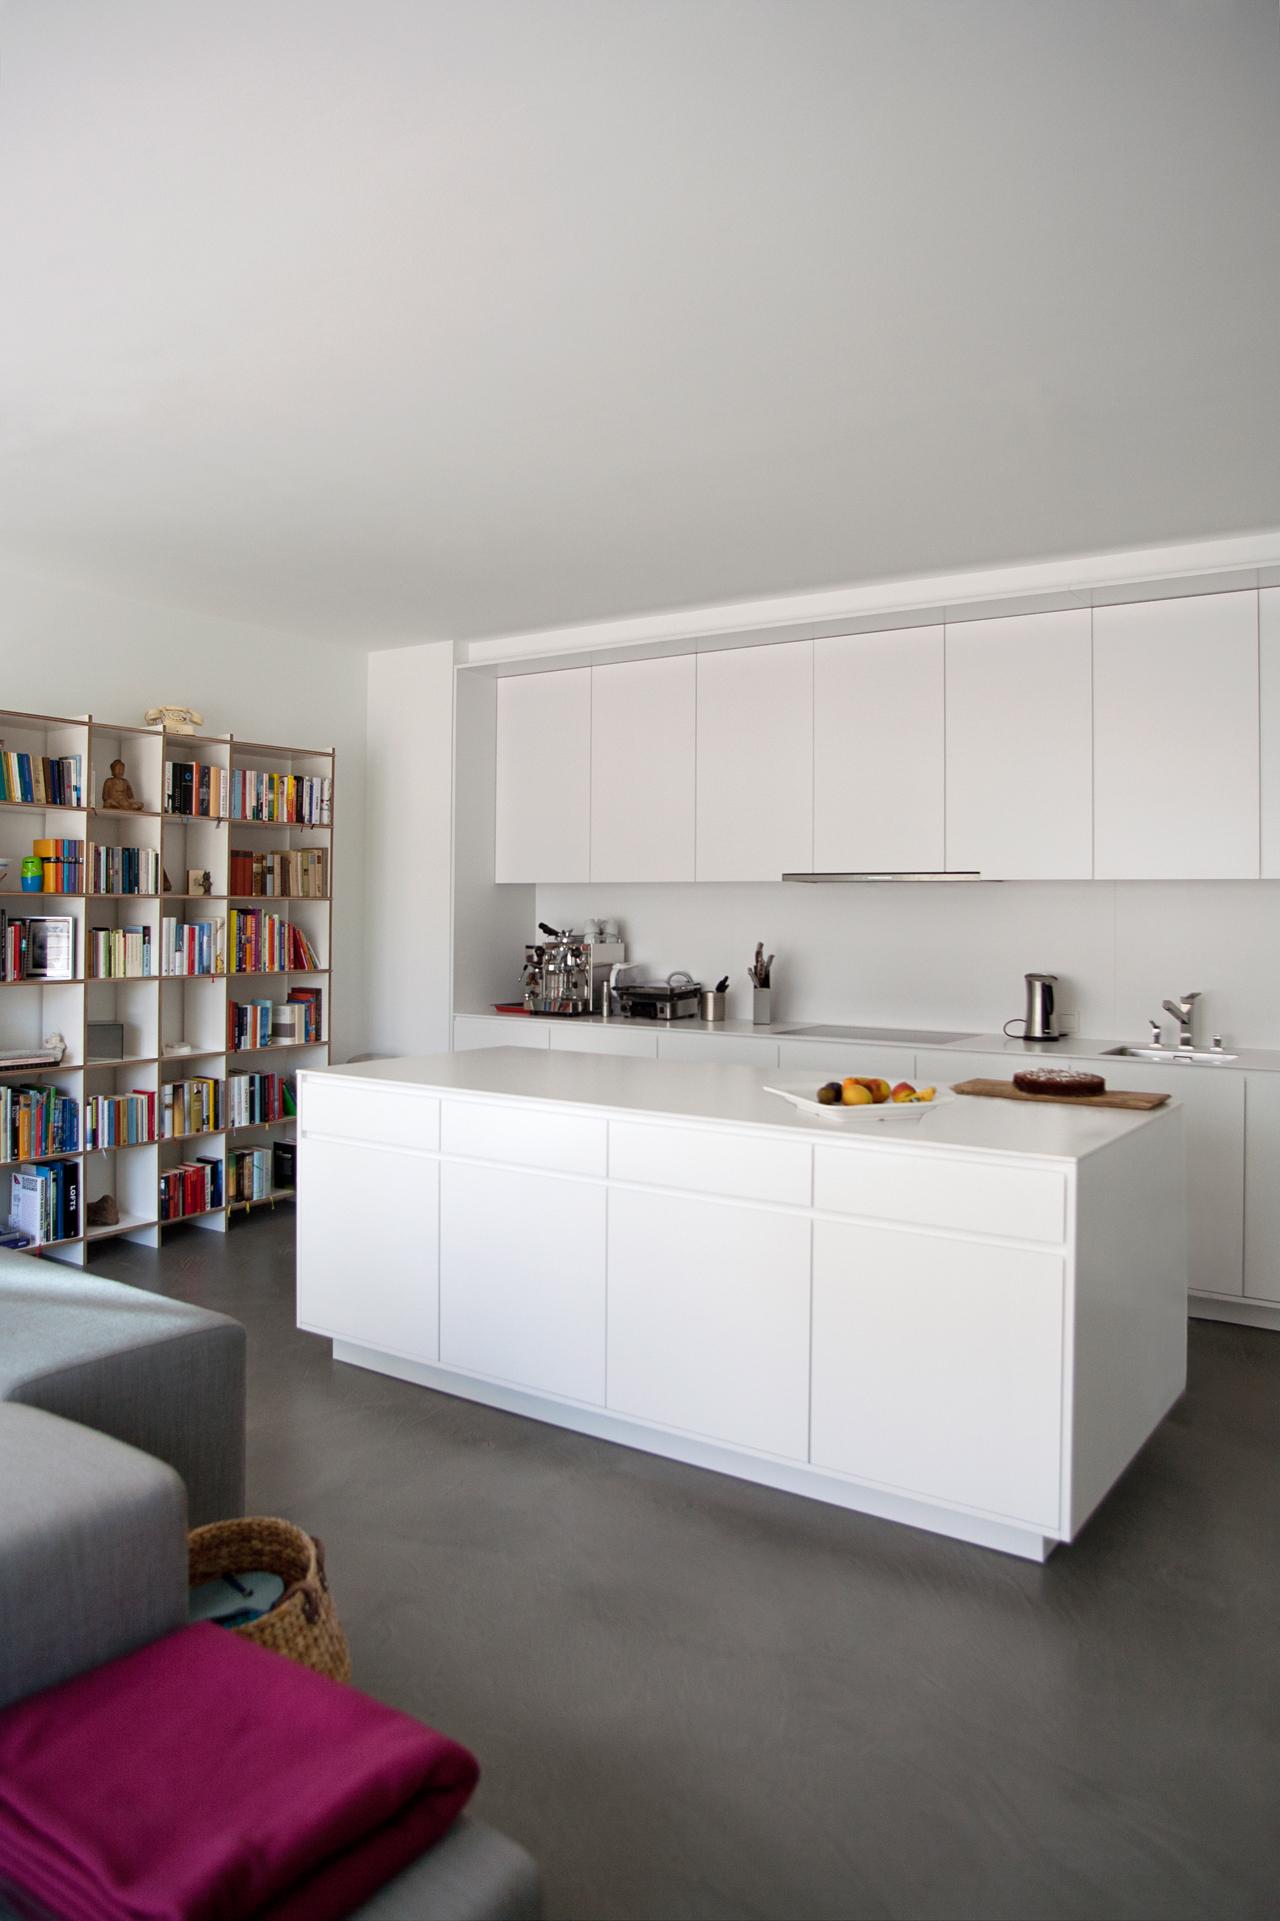 multiplexplatte arbeitsplatte k che outdoor k che ikea. Black Bedroom Furniture Sets. Home Design Ideas